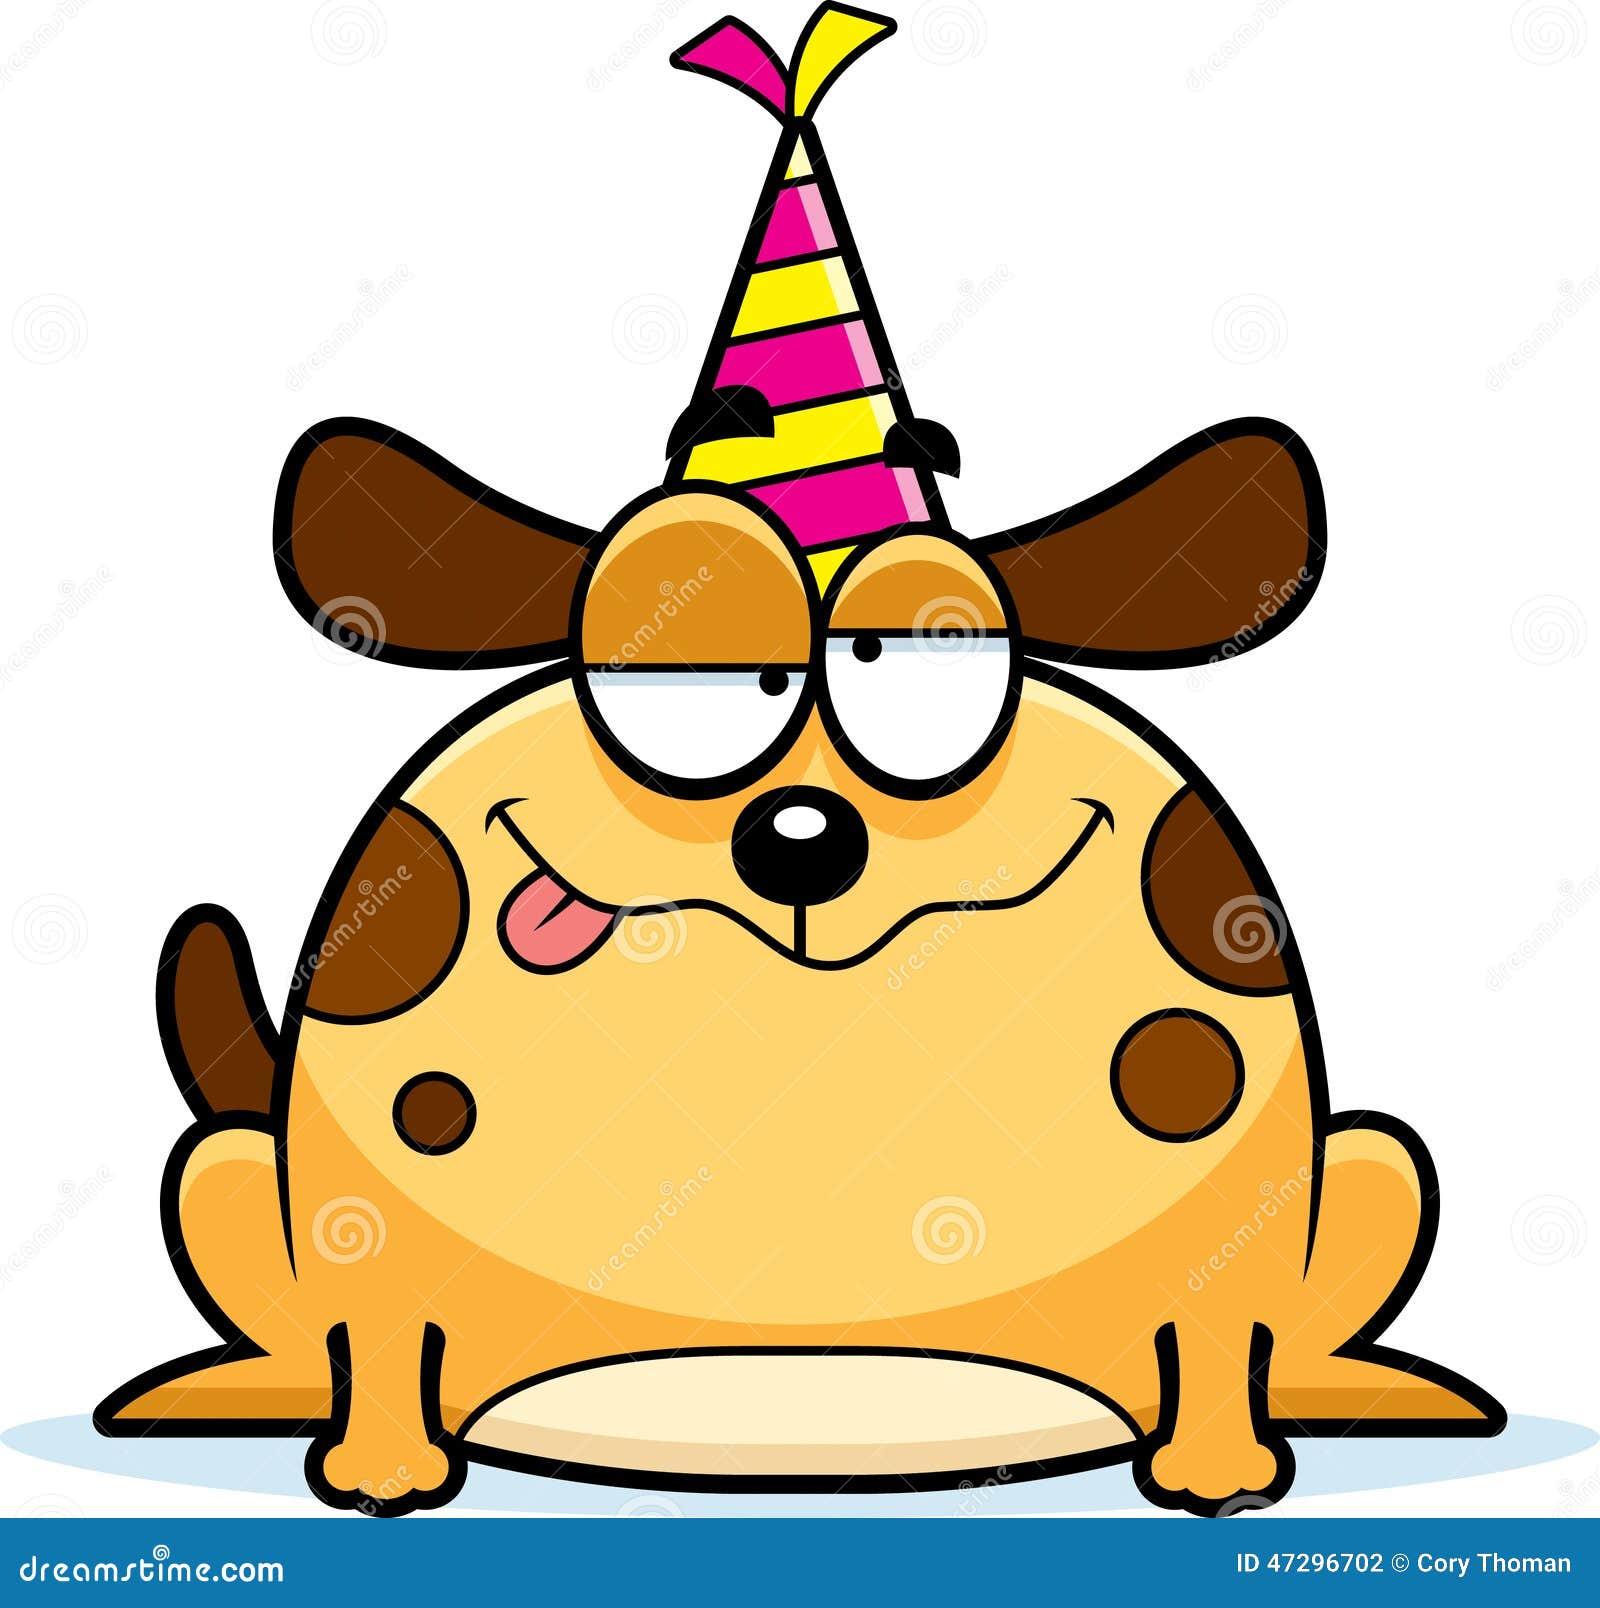 clipart dog birthday - photo #48